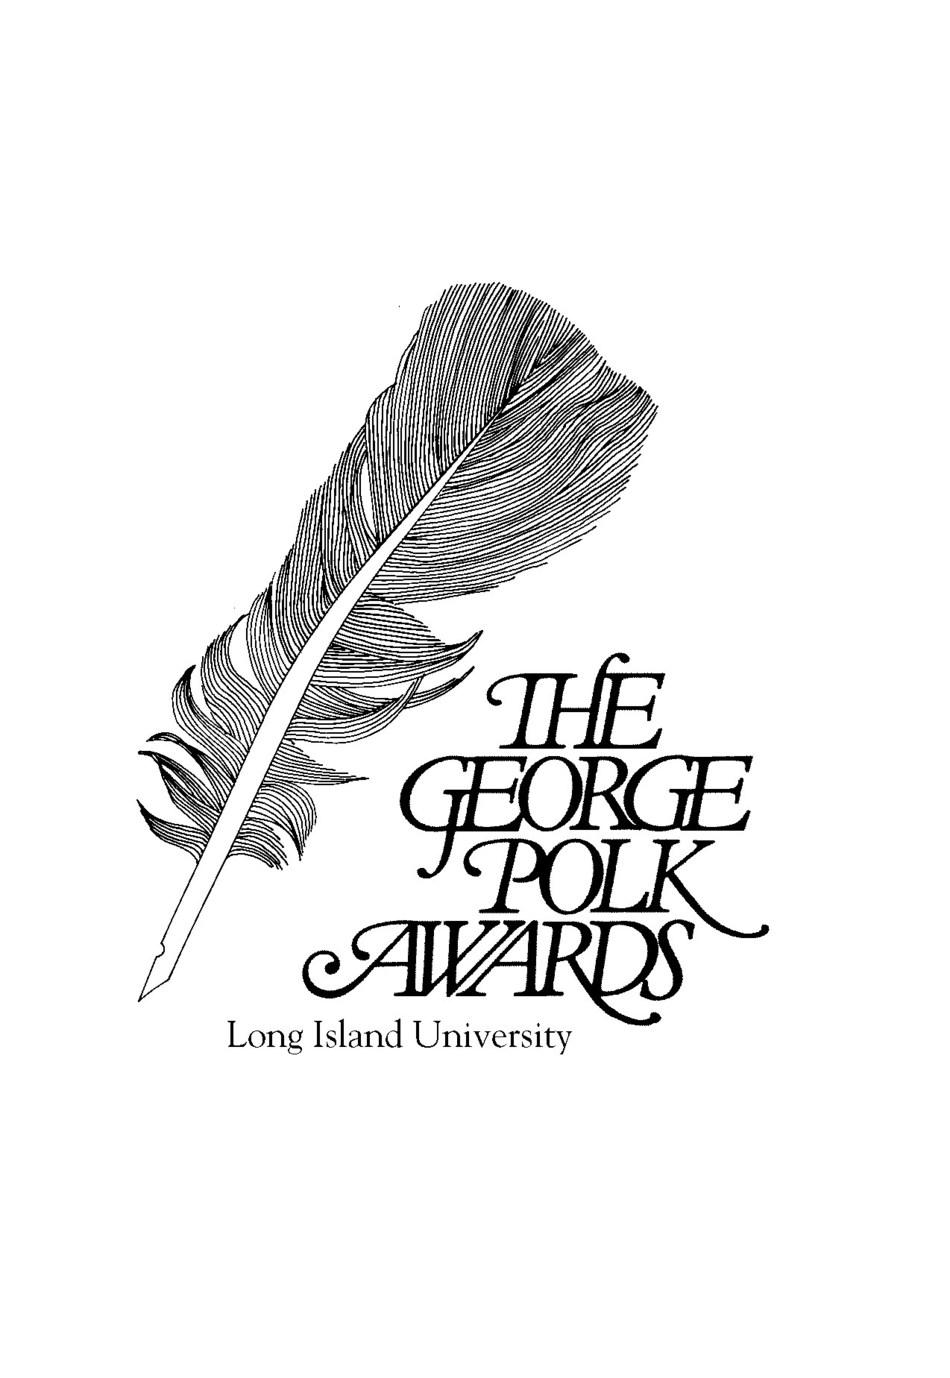 The George Polk Awards